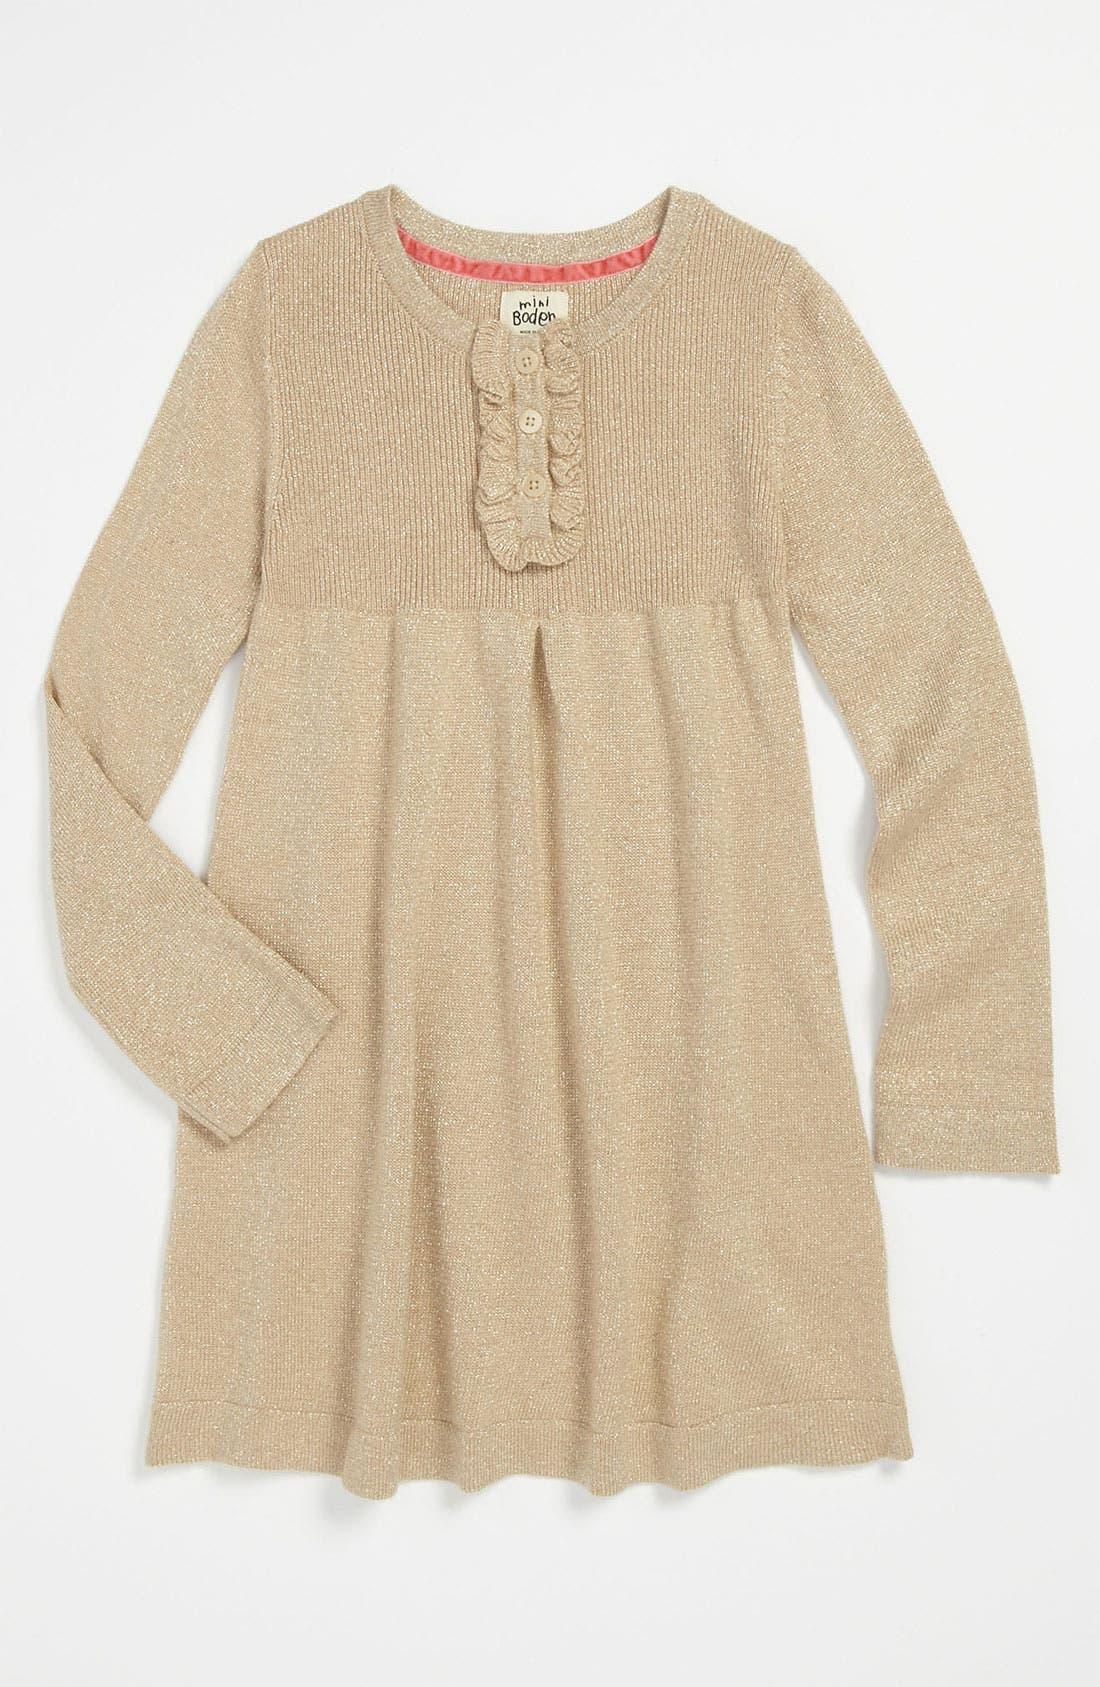 Main Image - Mini Boden 'Pretty' Ruffle Dress (Little Girls & Big Girls)